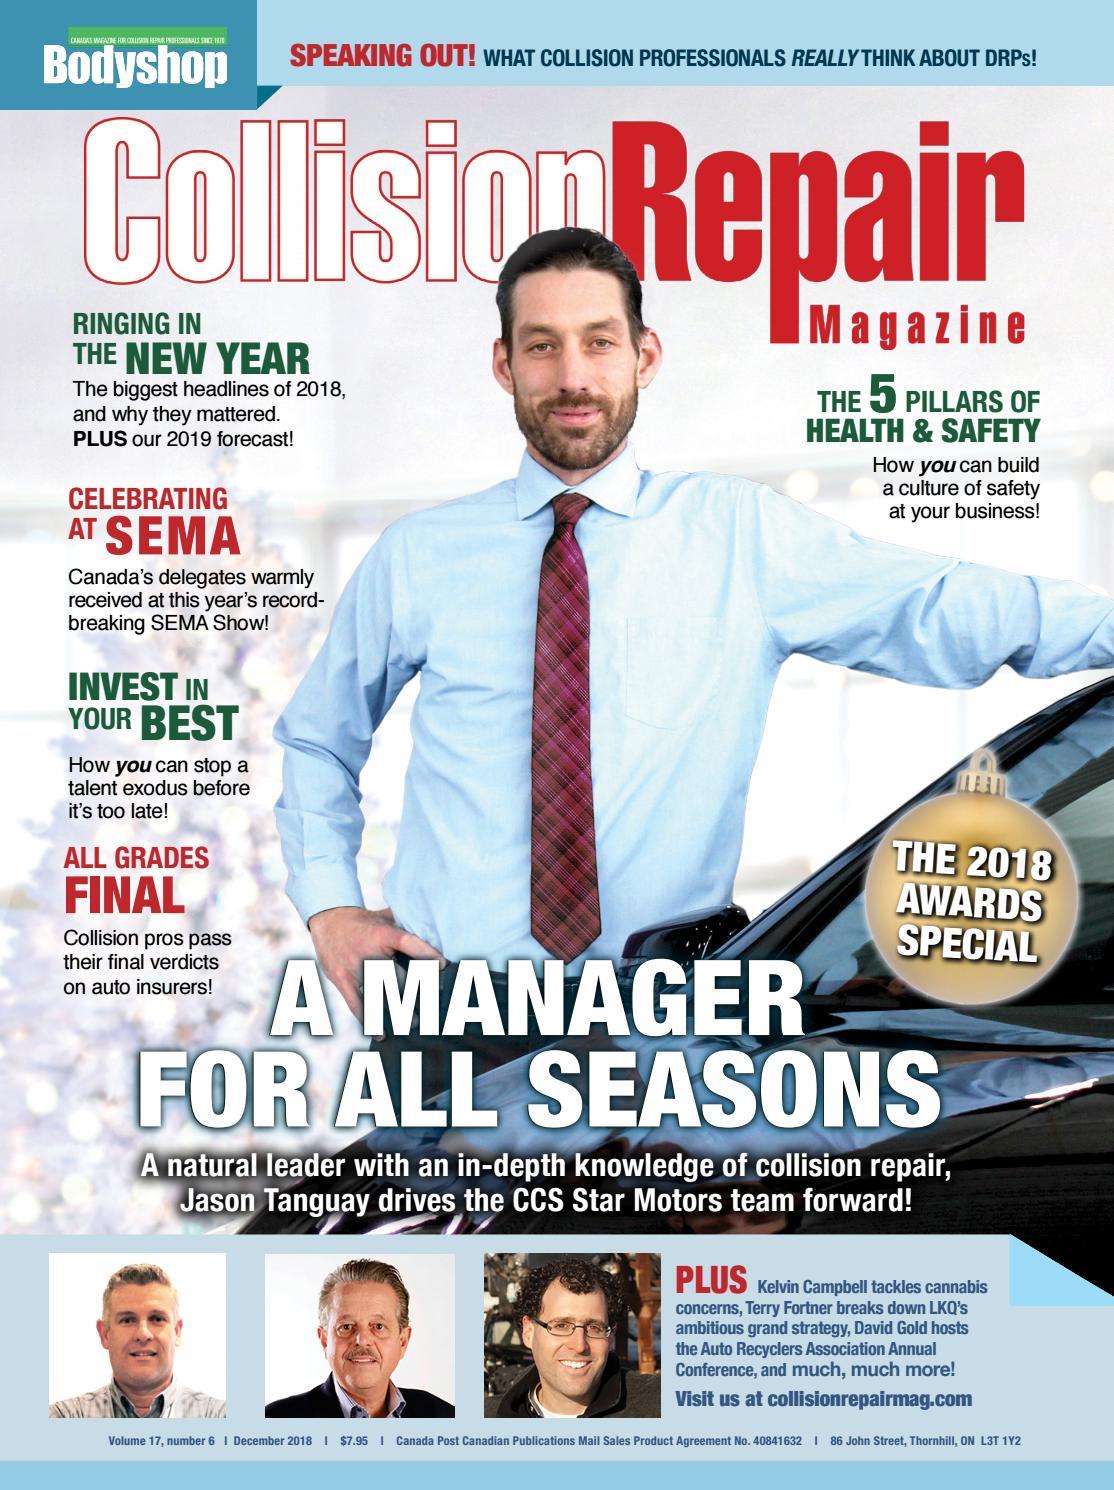 Collision Repair Magazine 17#6 by Media Matters - issuu